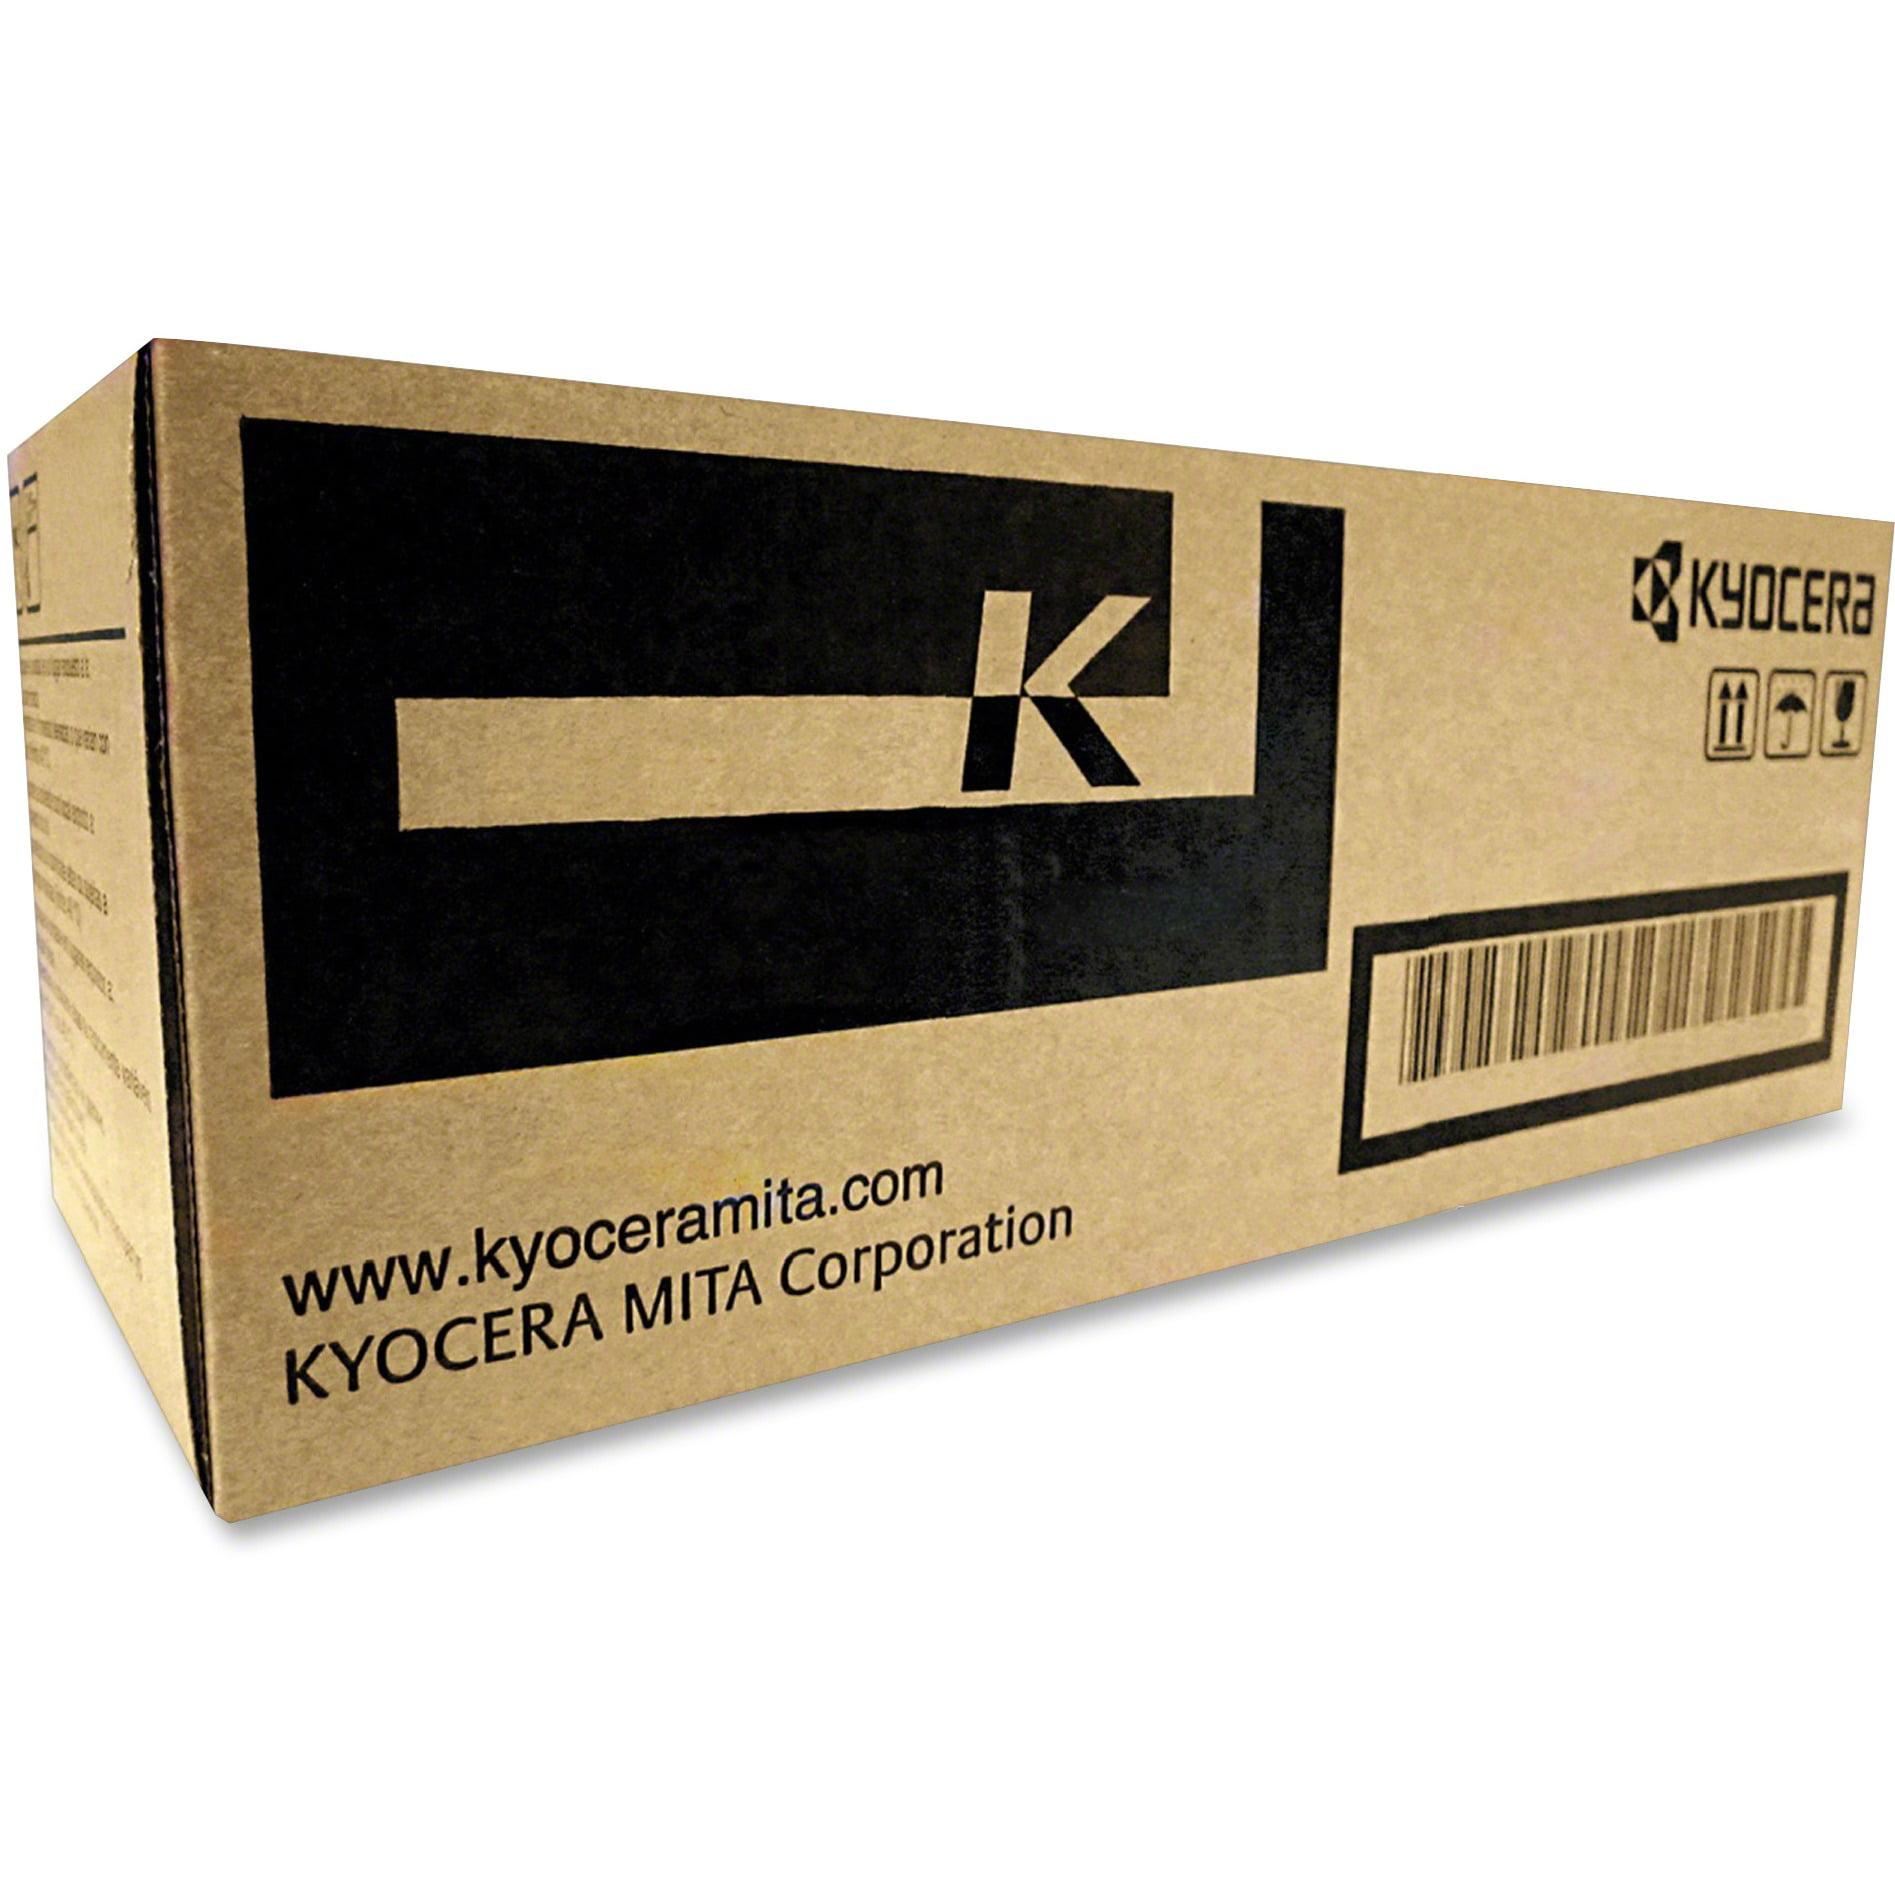 Kyocera, KYOTK342, FS-2020D Toner Cartridge, 1 Each